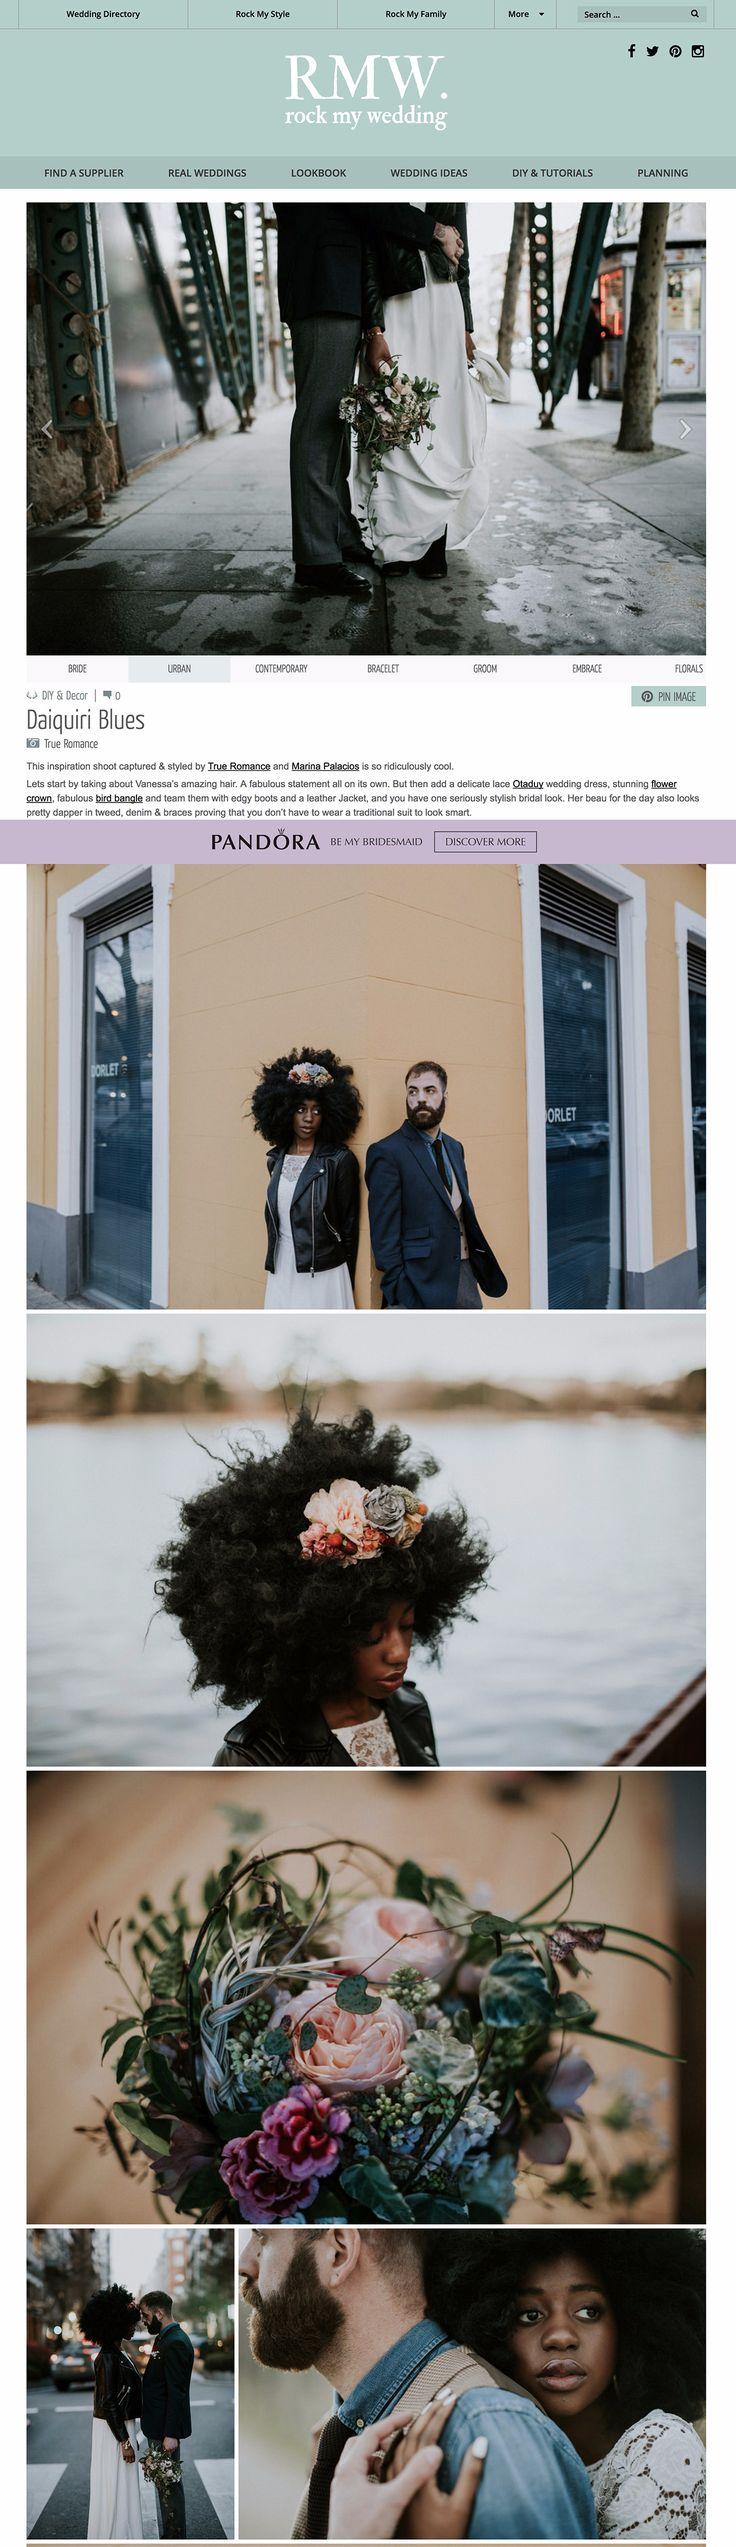 [ FEATURED ] Rock my wedding